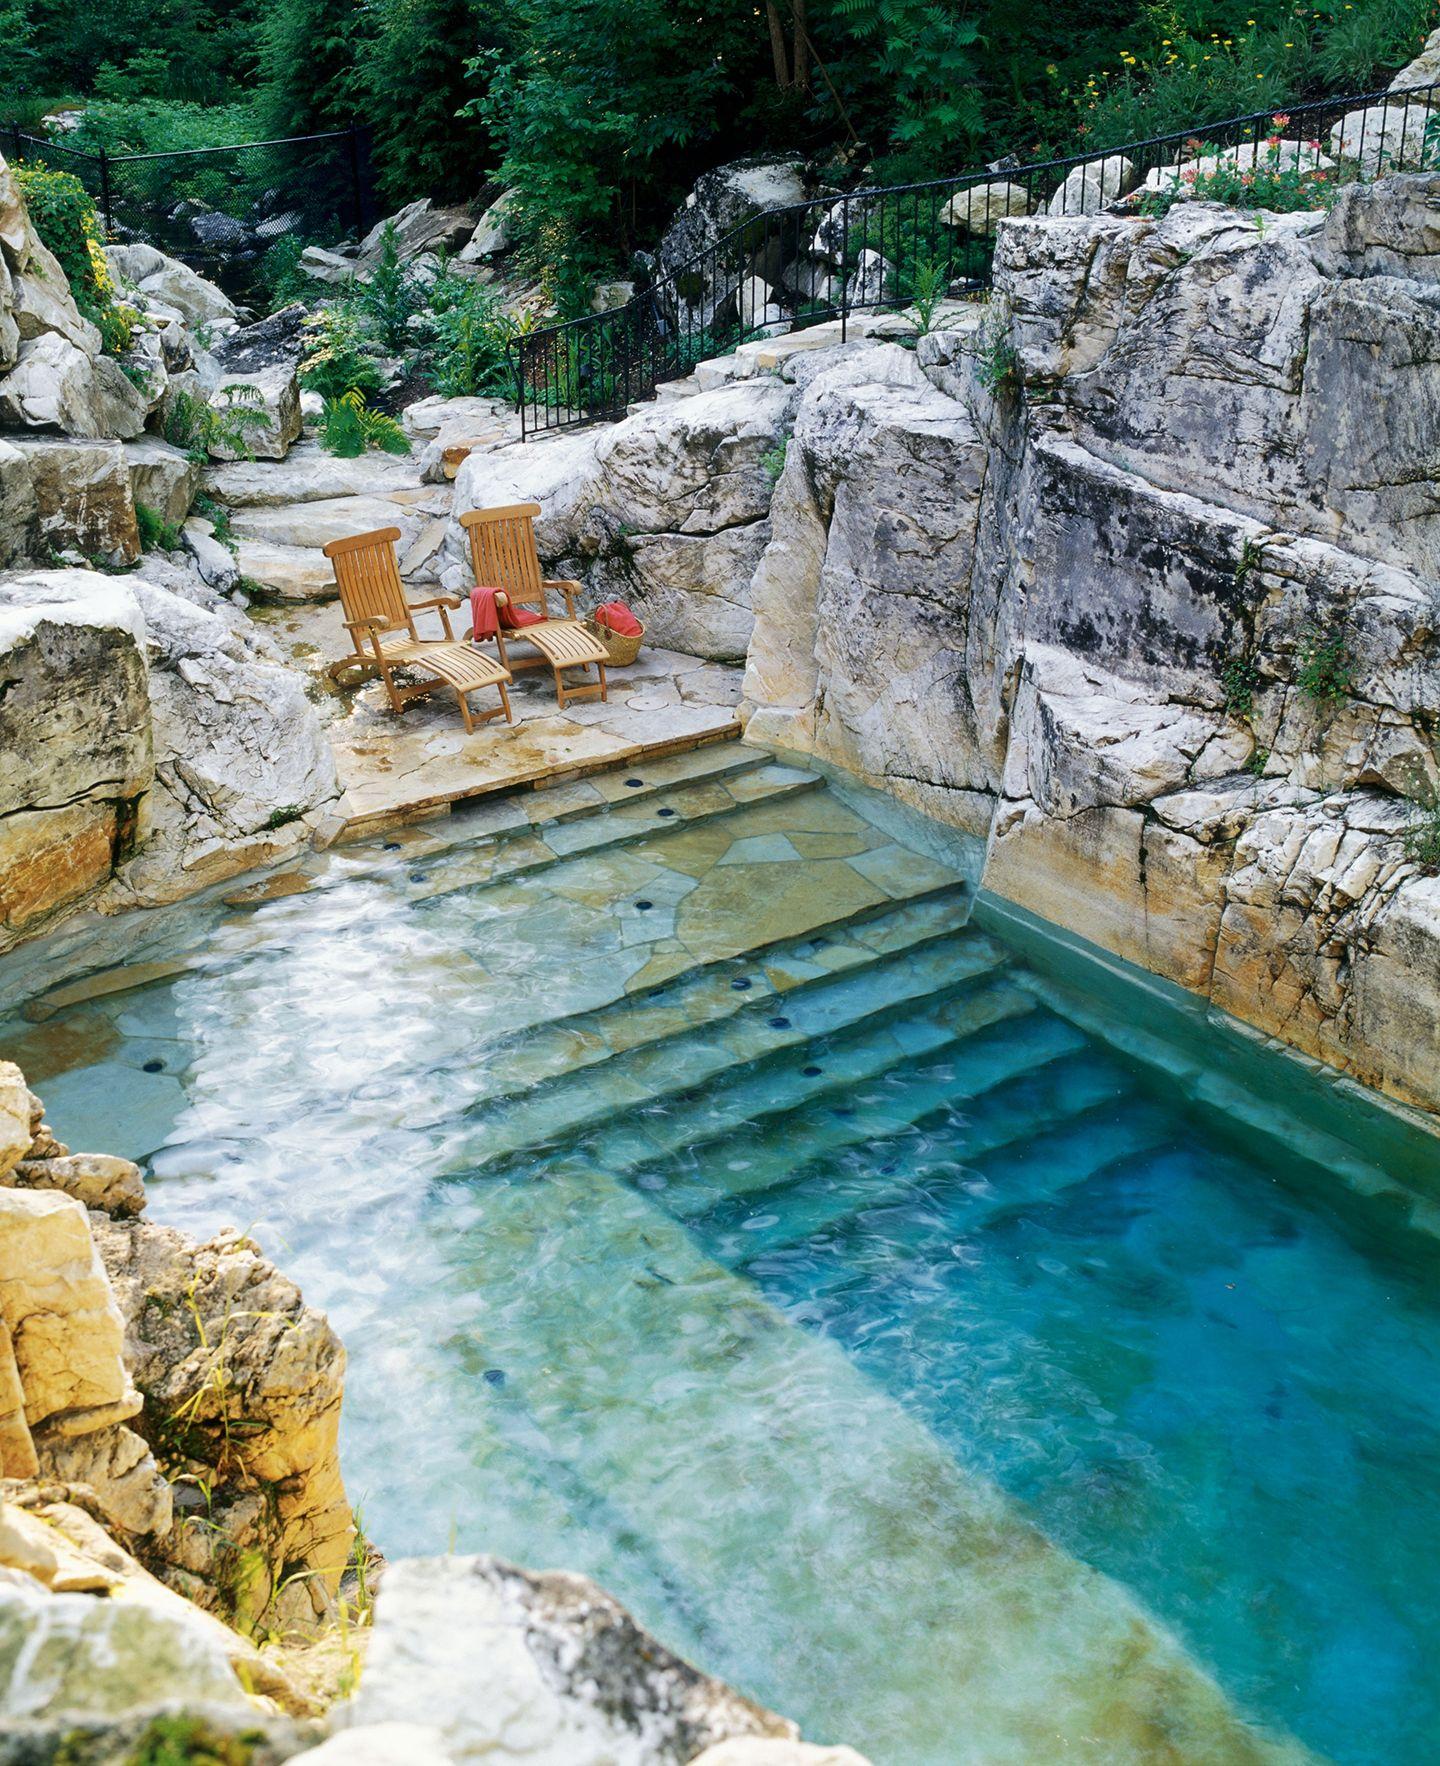 ❧ Aqua Pool & Patio | poolfyi | Watering holes | Pinterest | Aqua ...